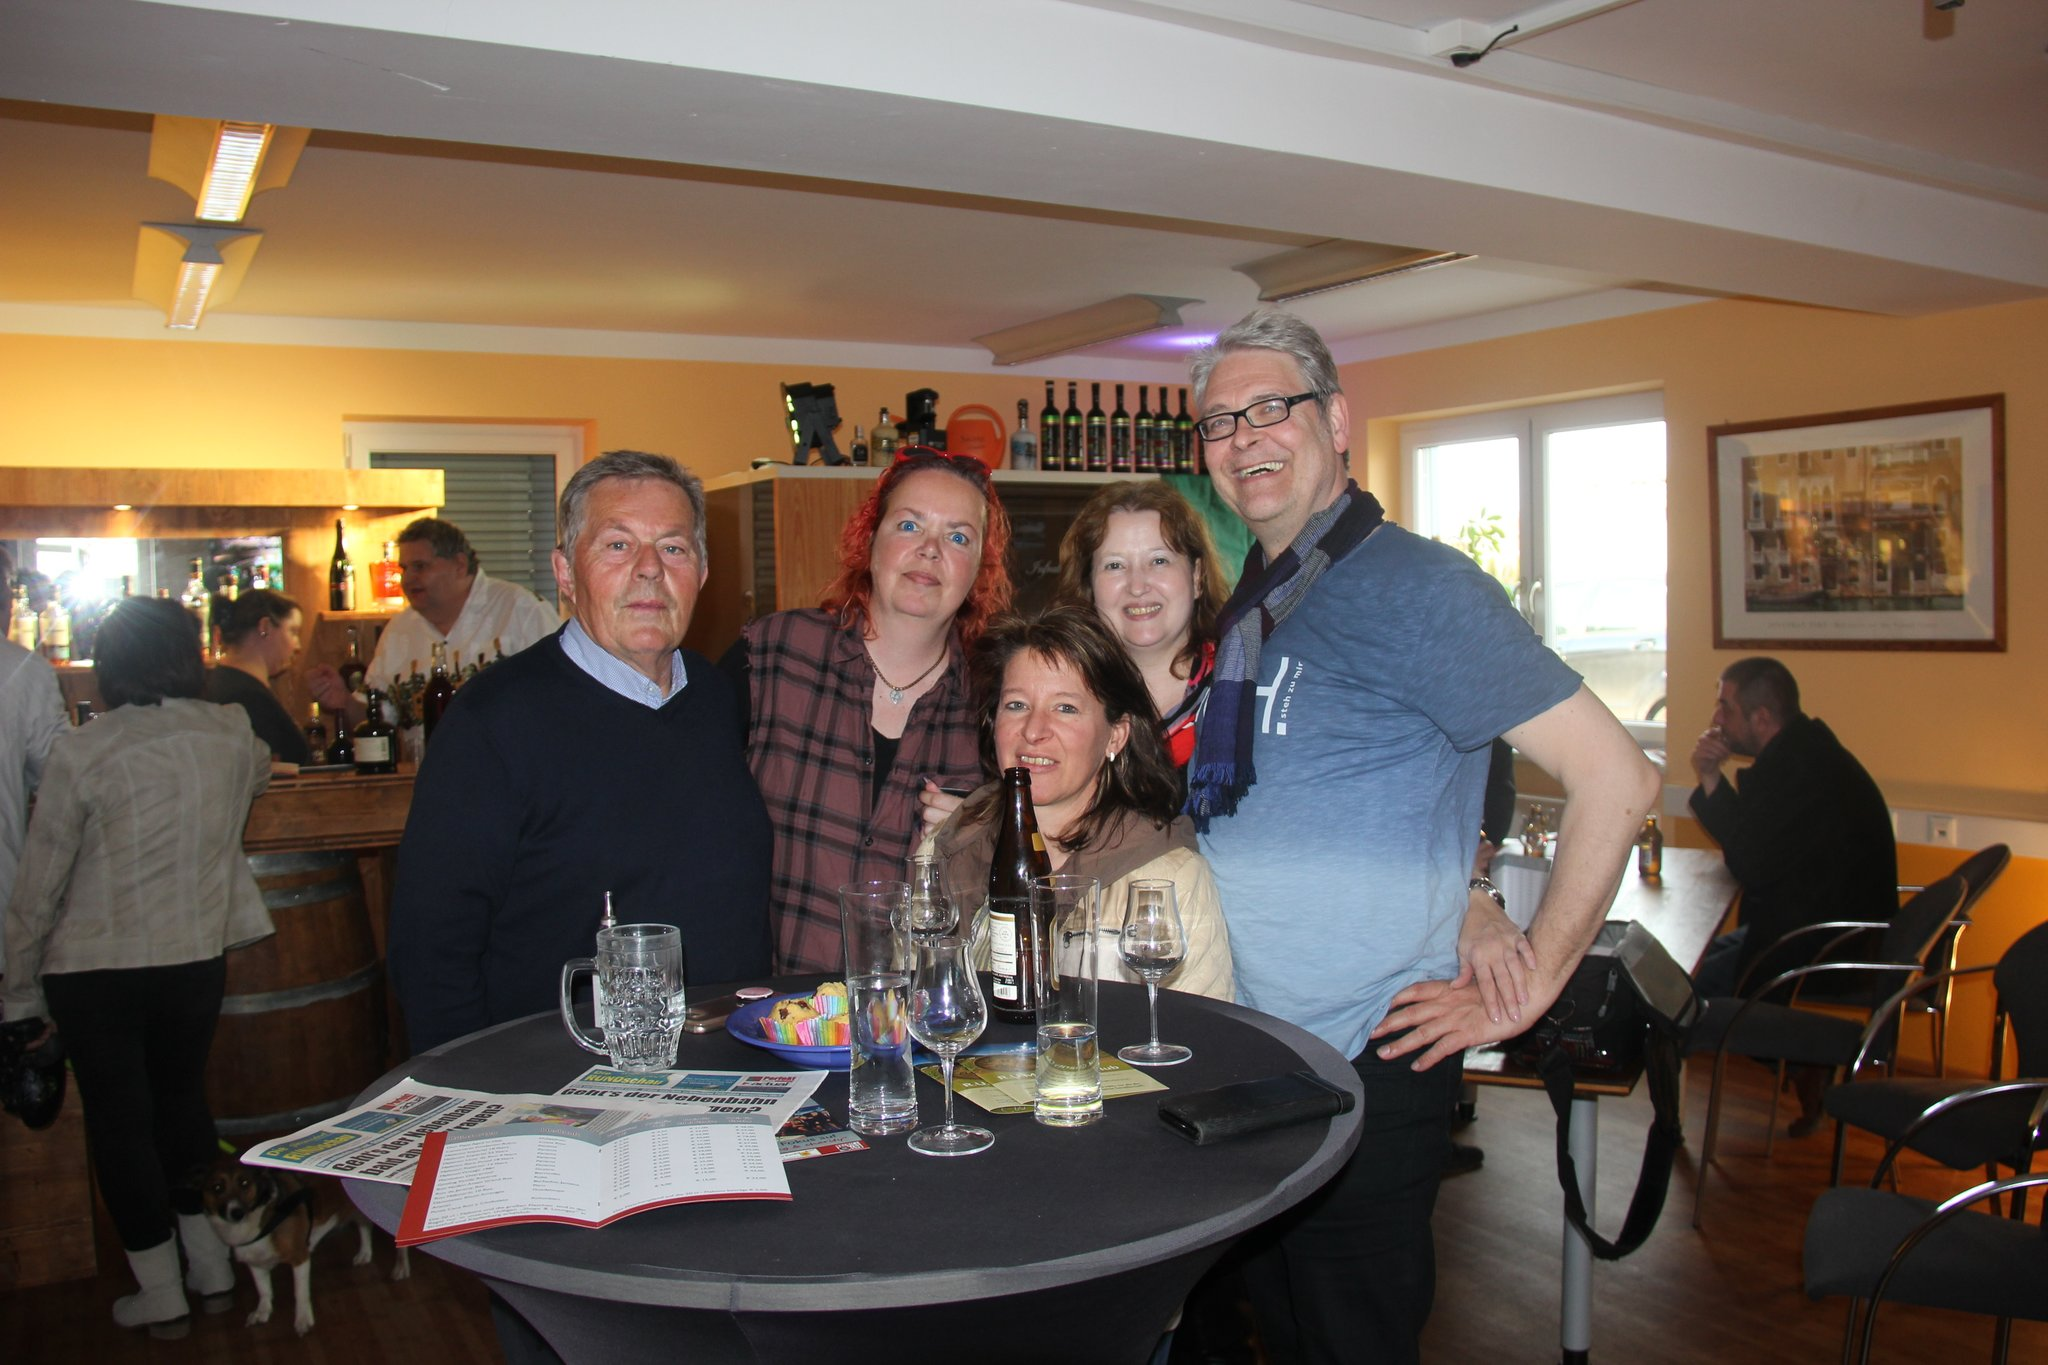 Bekanntschaften in Hopfgarten im Brixental - Partnersuche